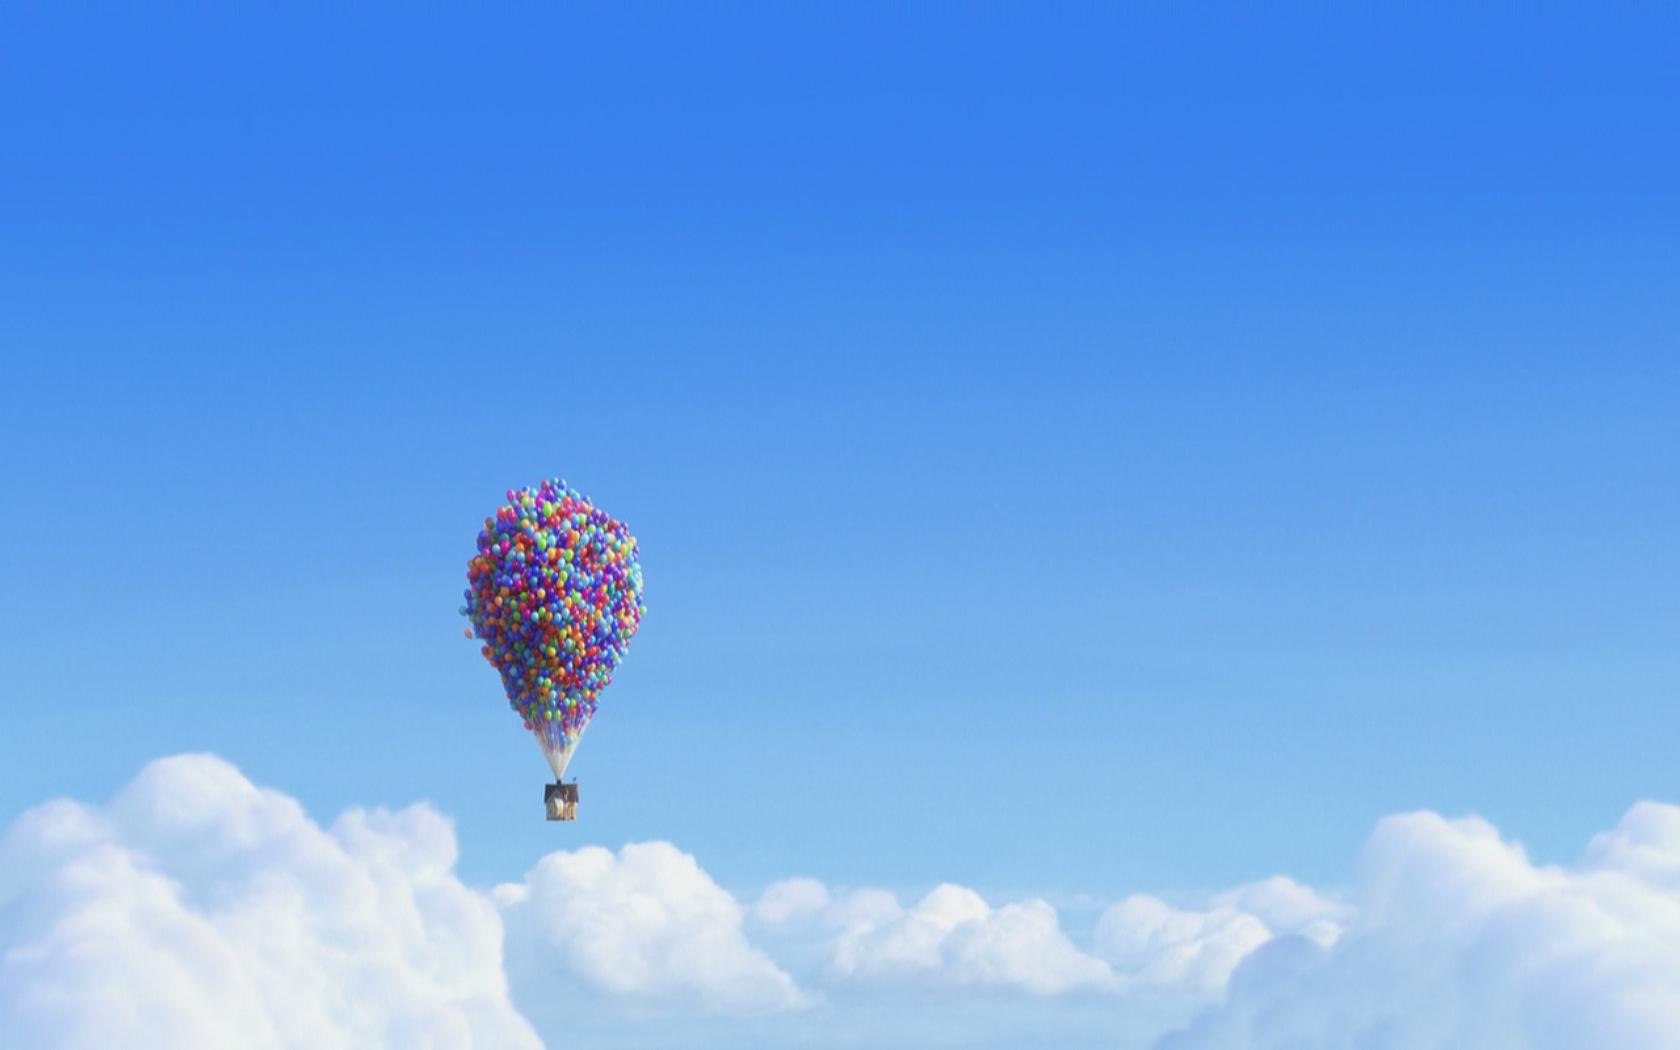 pixar up wallpaper 14 by pwn247 customization wallpaper hdtv 1680x1050